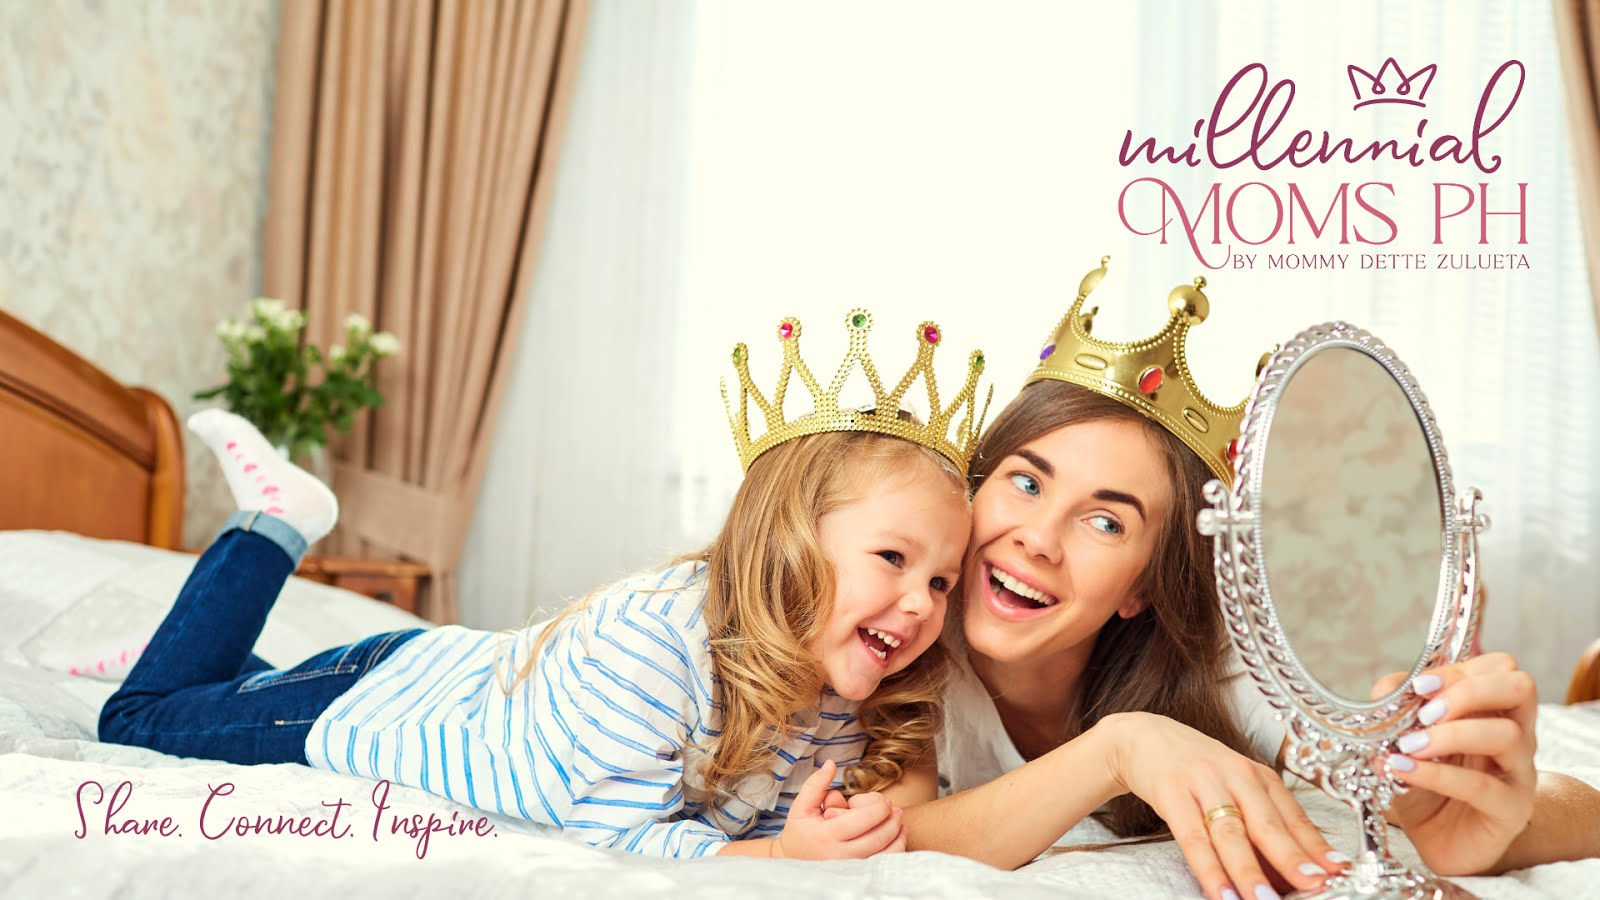 Millennial Moms PH: A passion project by Dette Zulueta